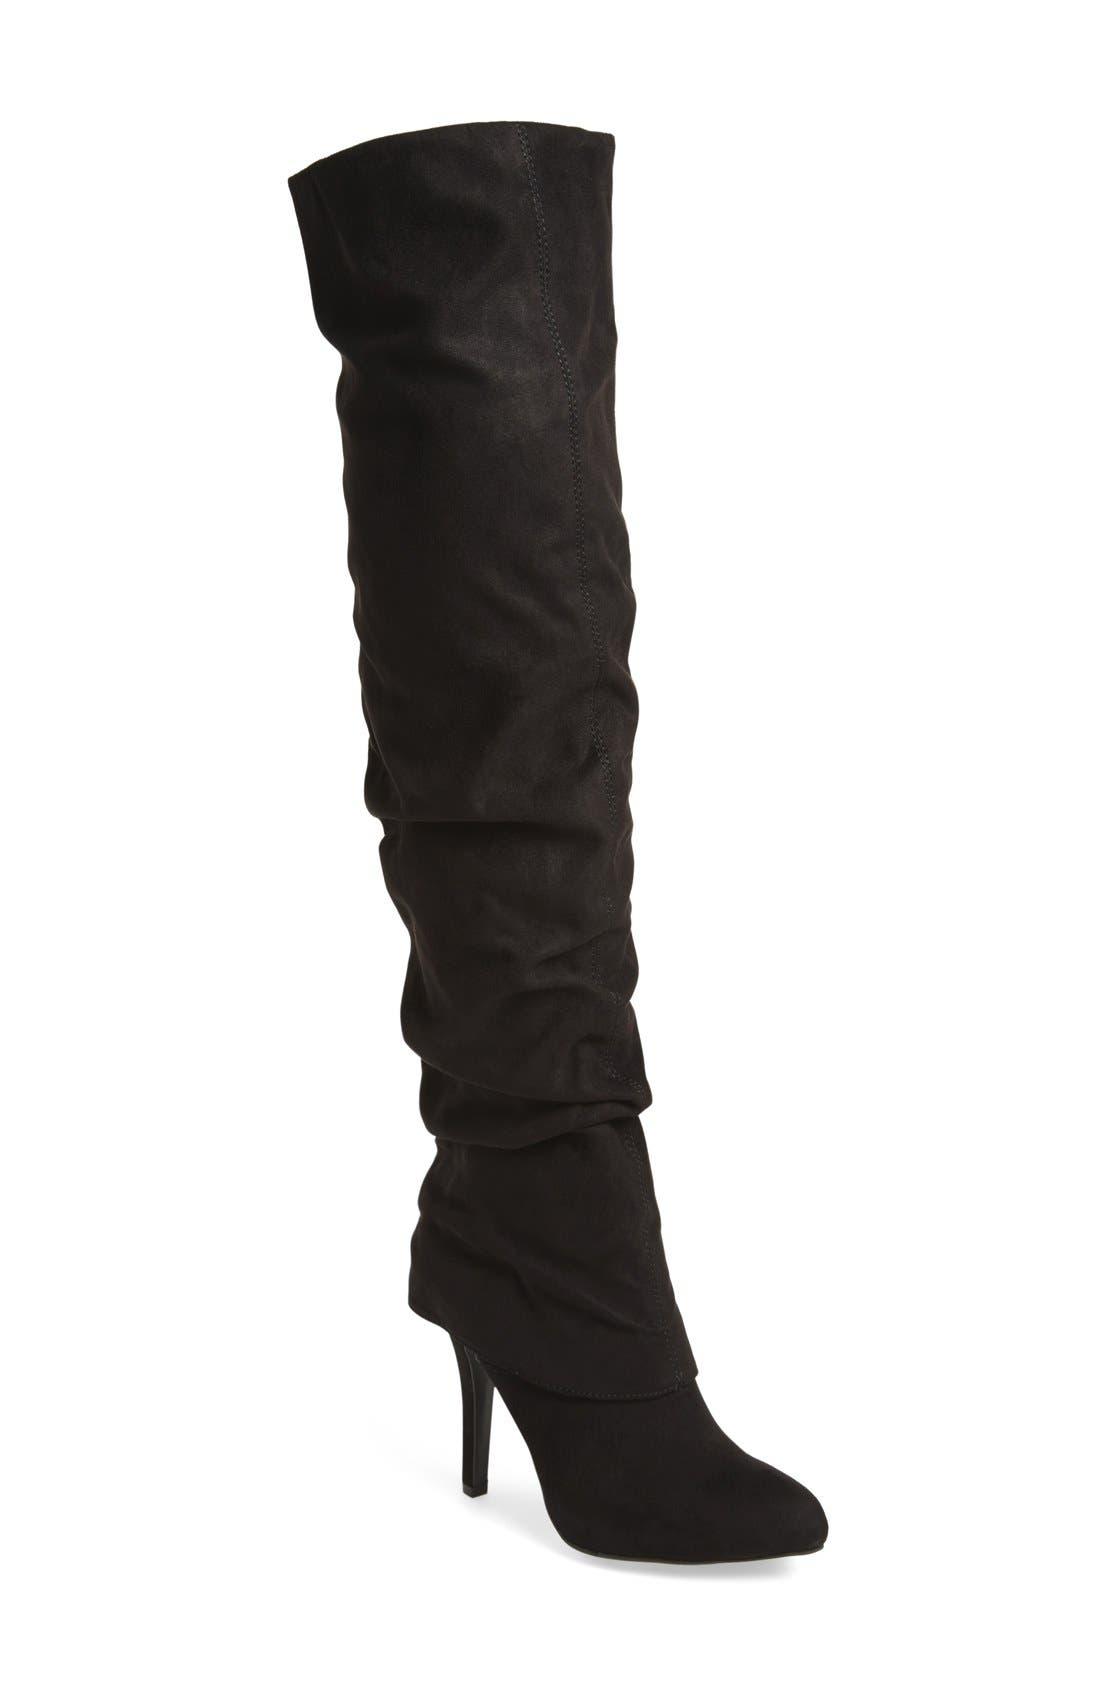 Alternate Image 1 Selected - Nina 'Kymari' Over the Knee Pointy Toe Boot (Women)